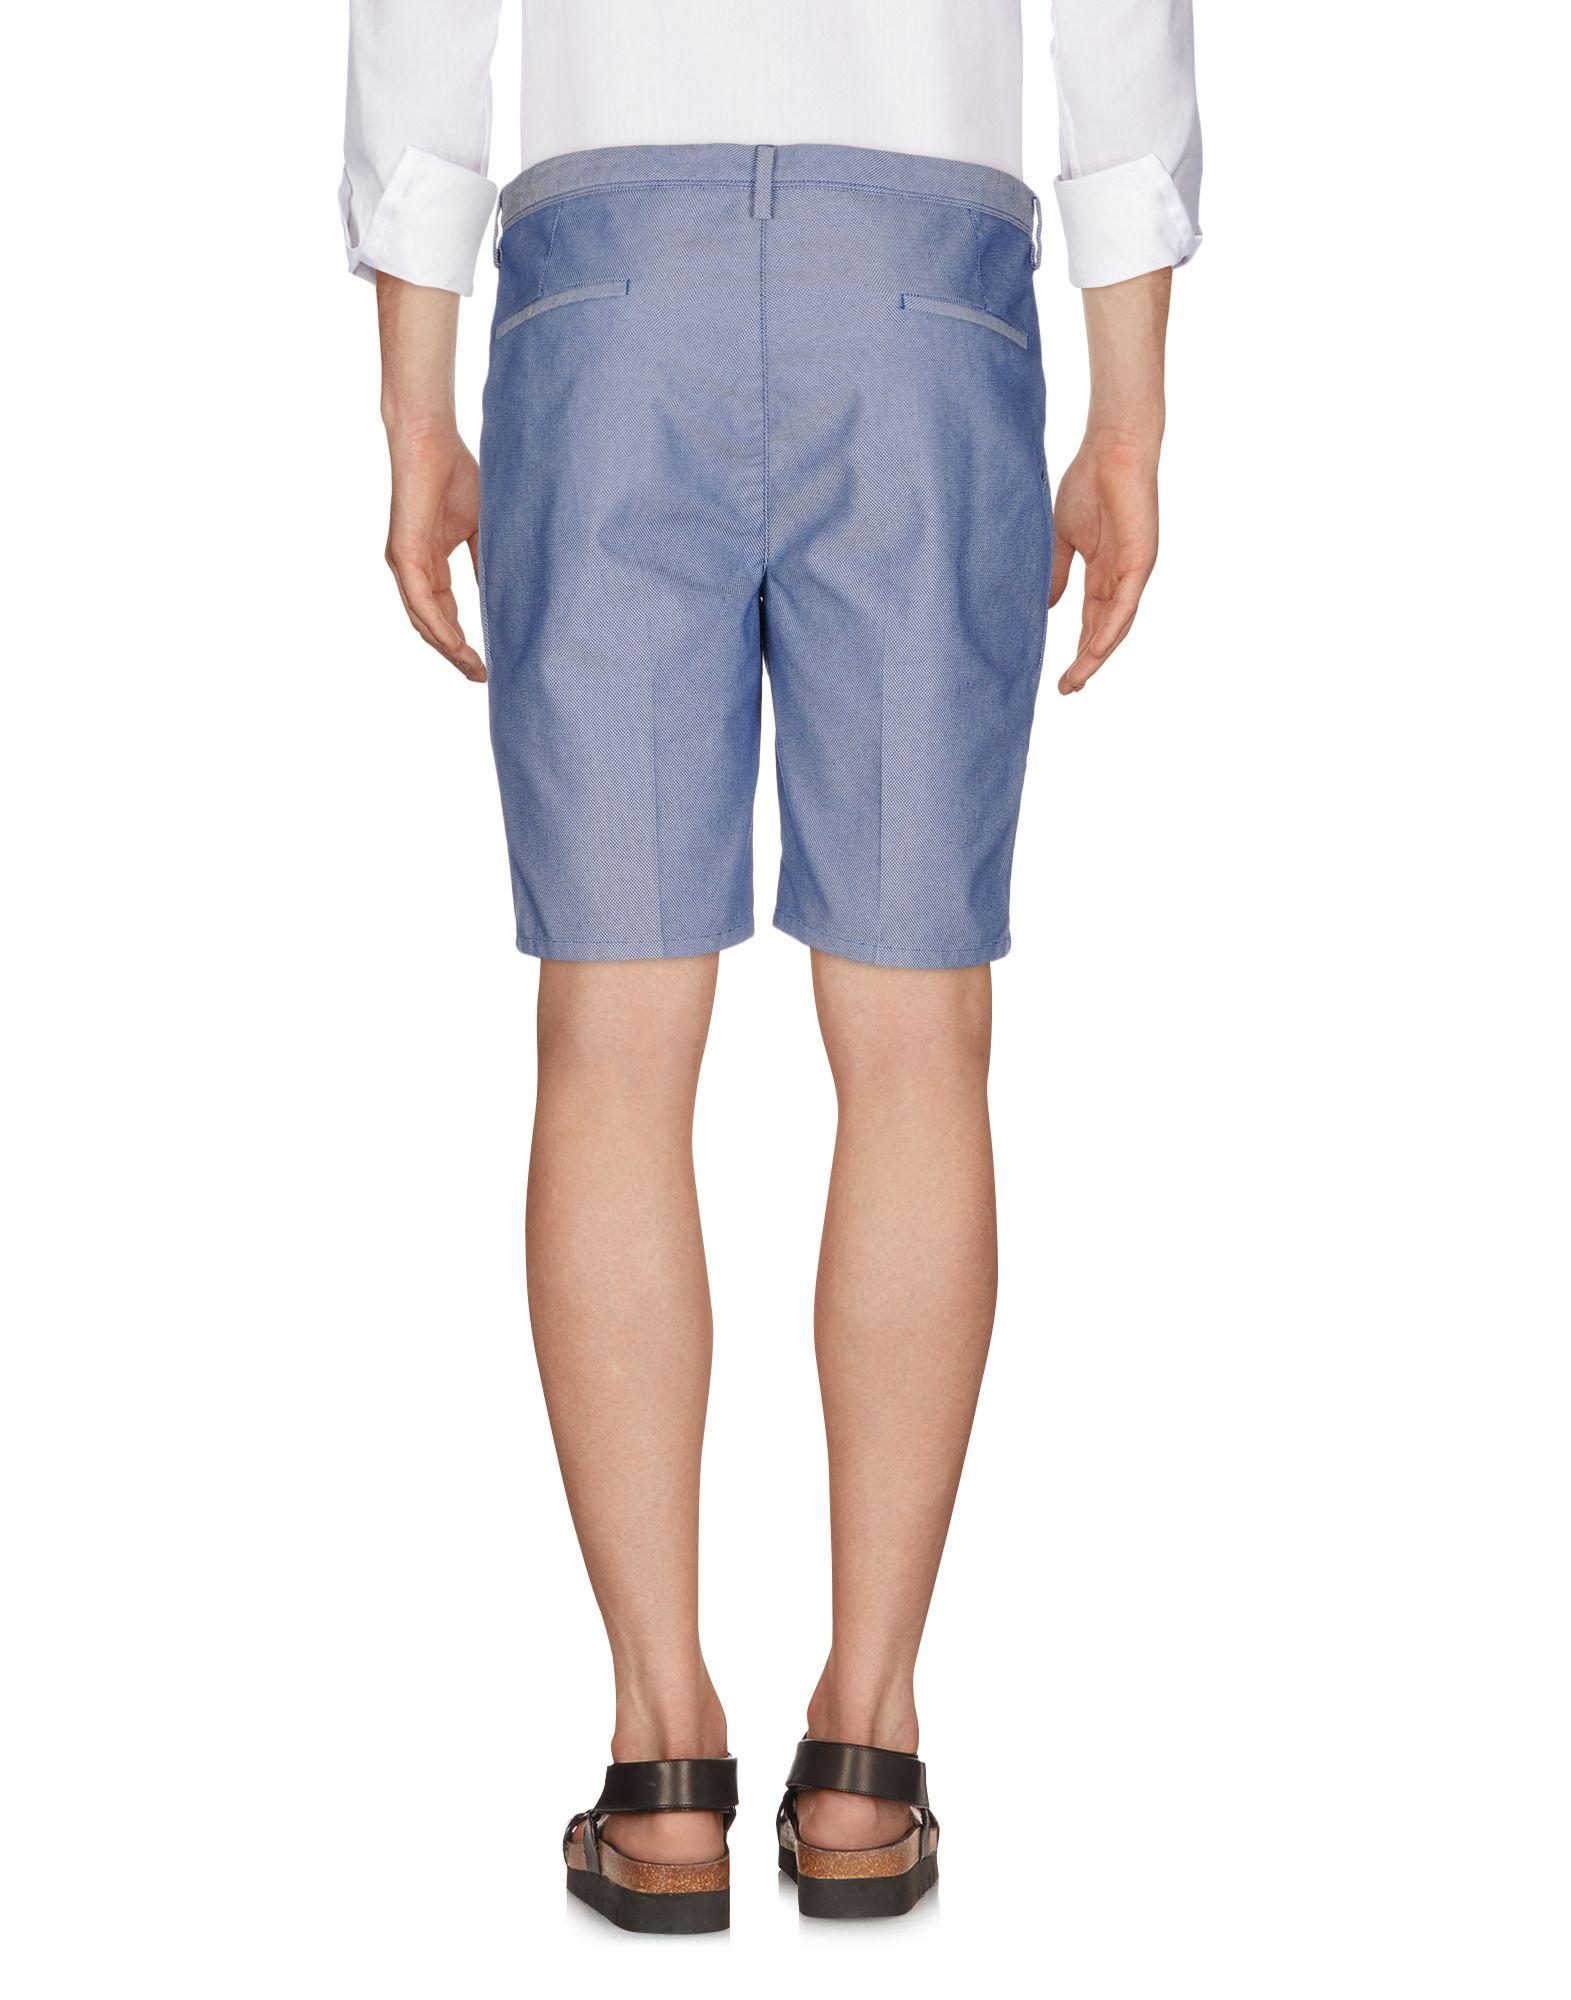 Shorts & Bermuda Bermuda & Scotch & Soda Uomo - 13126010TR fbe794